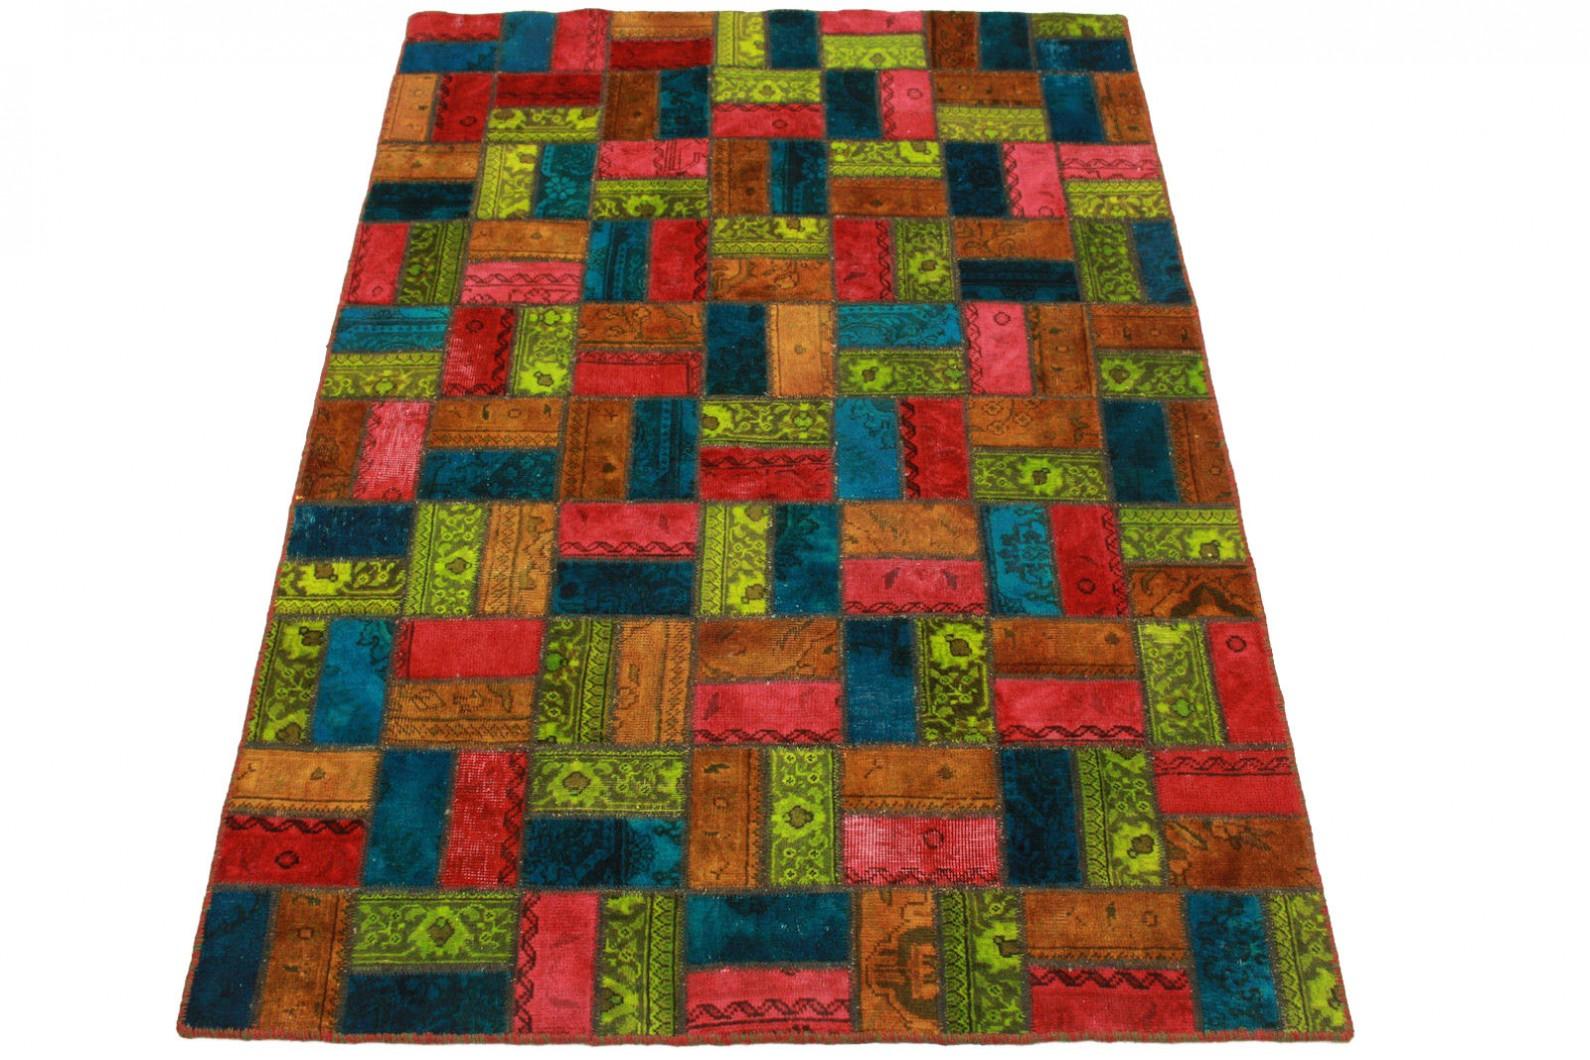 patchwork teppich orange rot blau in 210x140cm 1001 1978. Black Bedroom Furniture Sets. Home Design Ideas